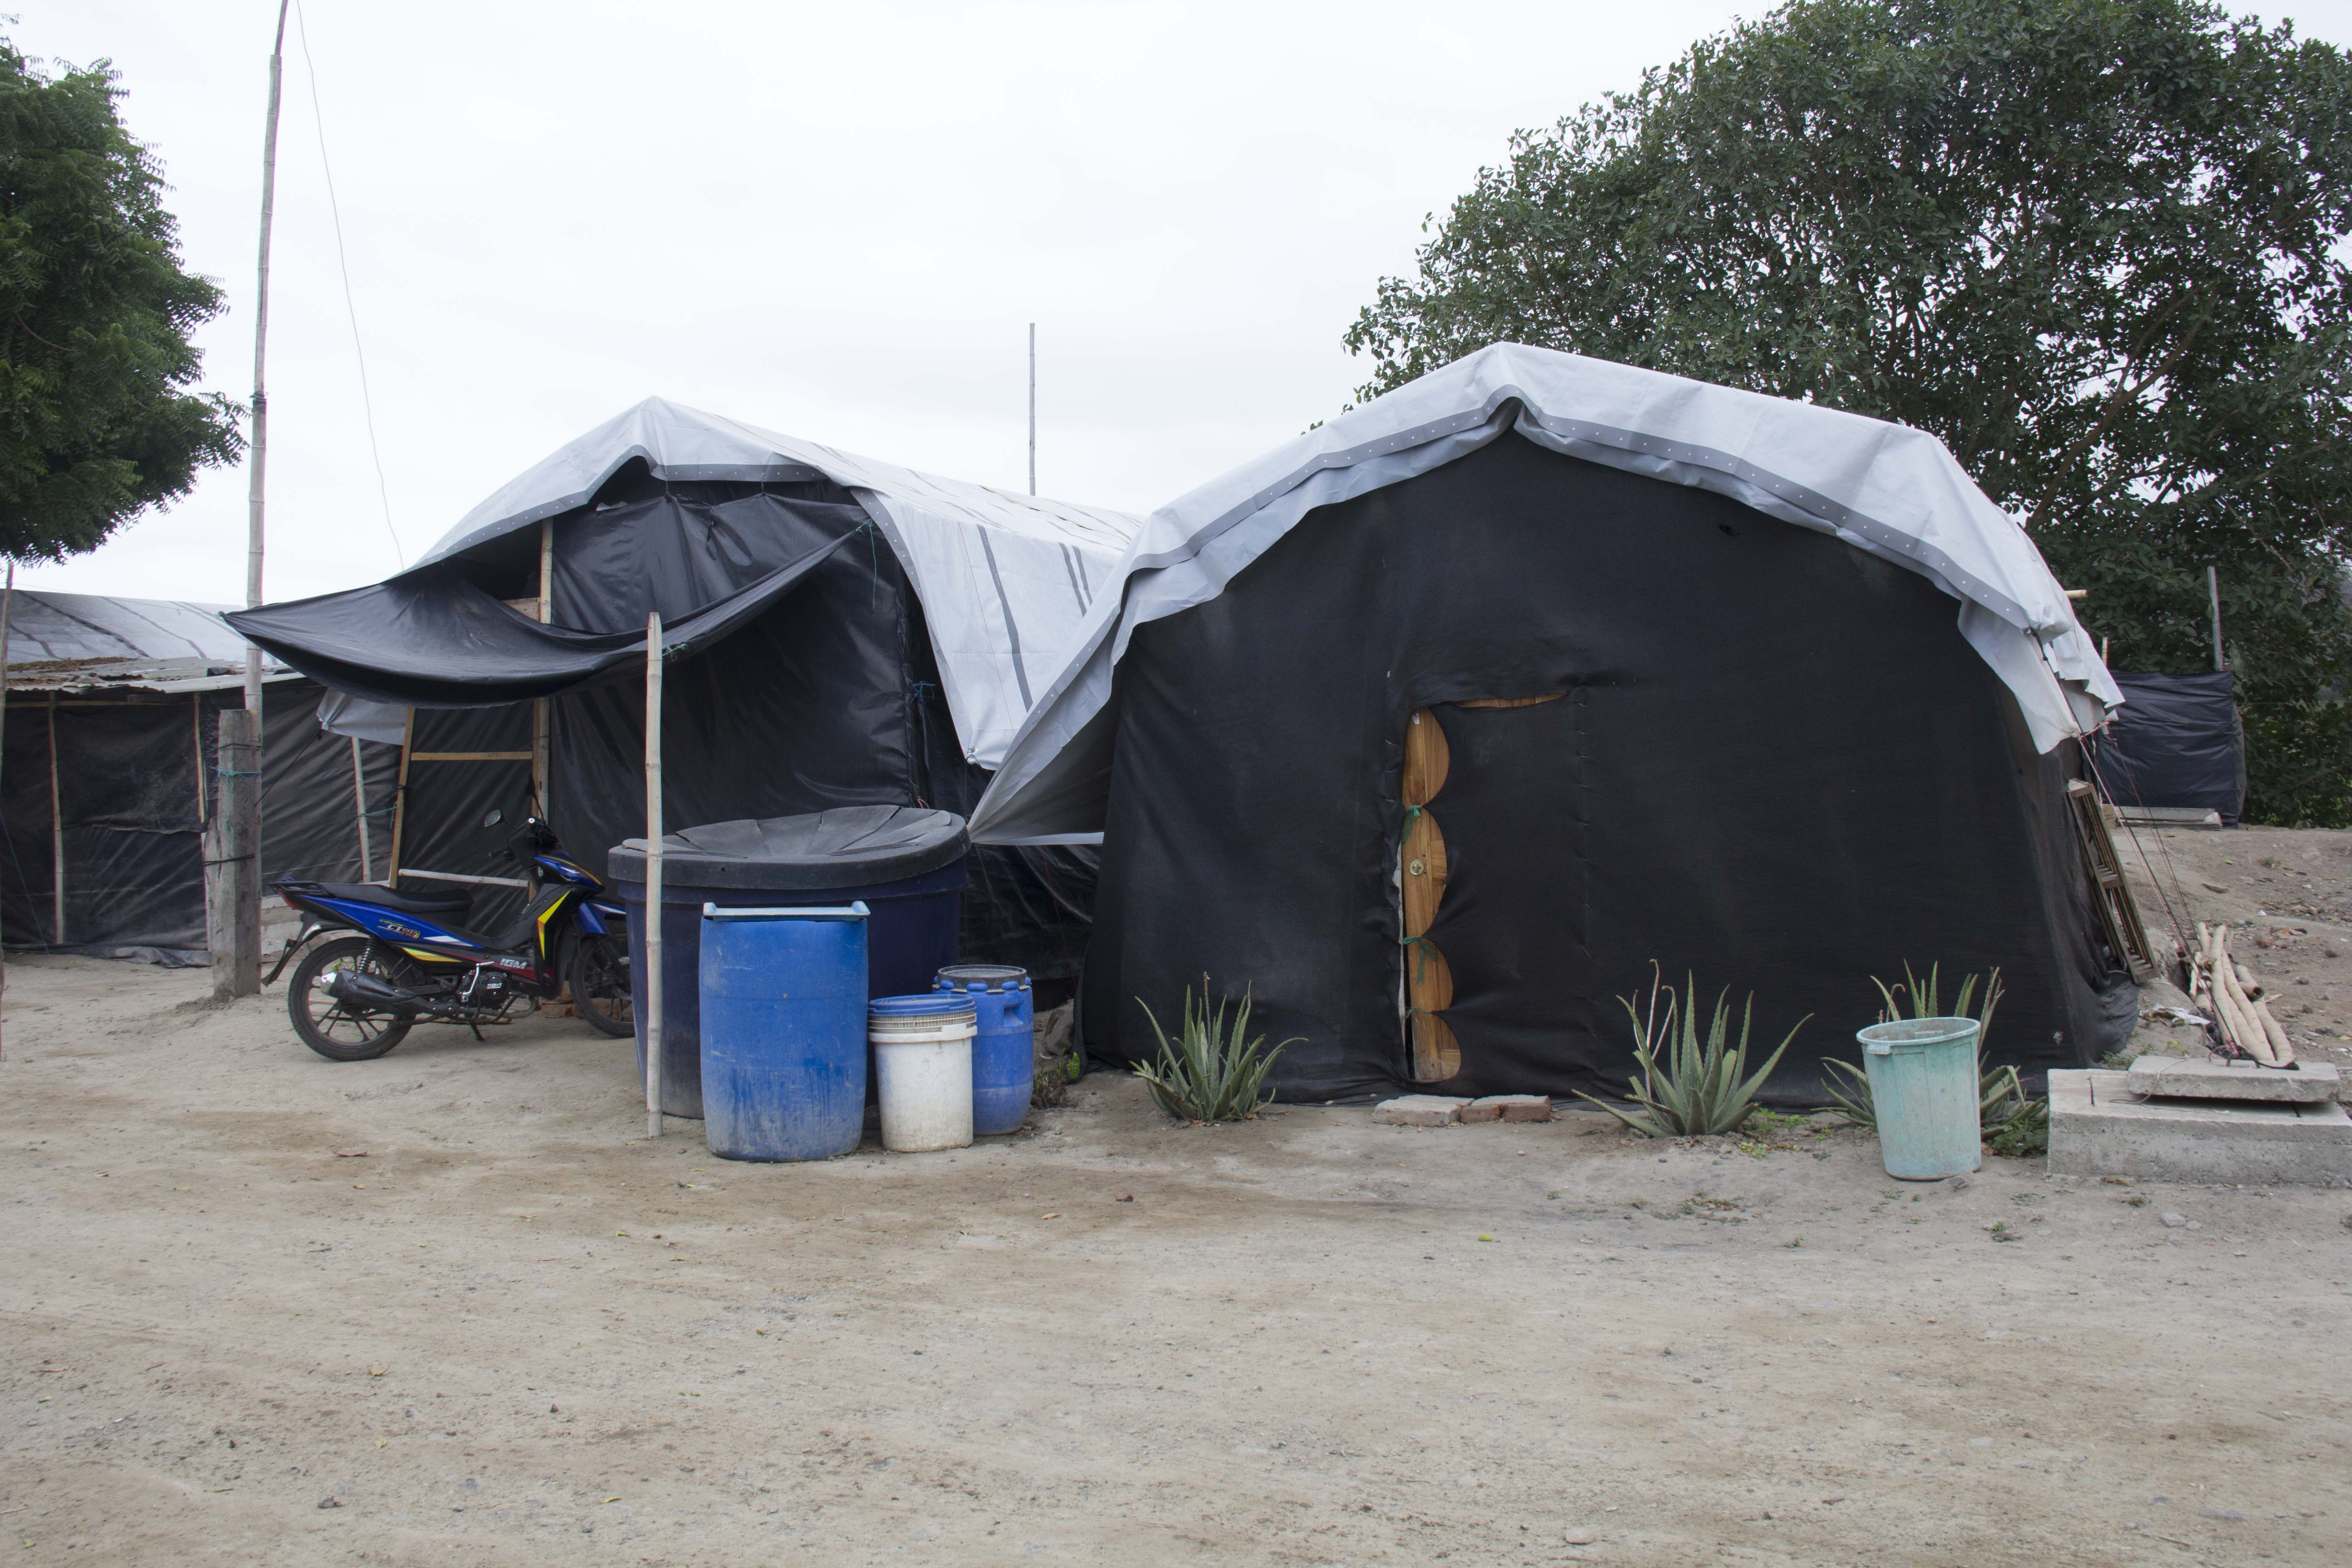 refugee homes at Ecuador in 2016